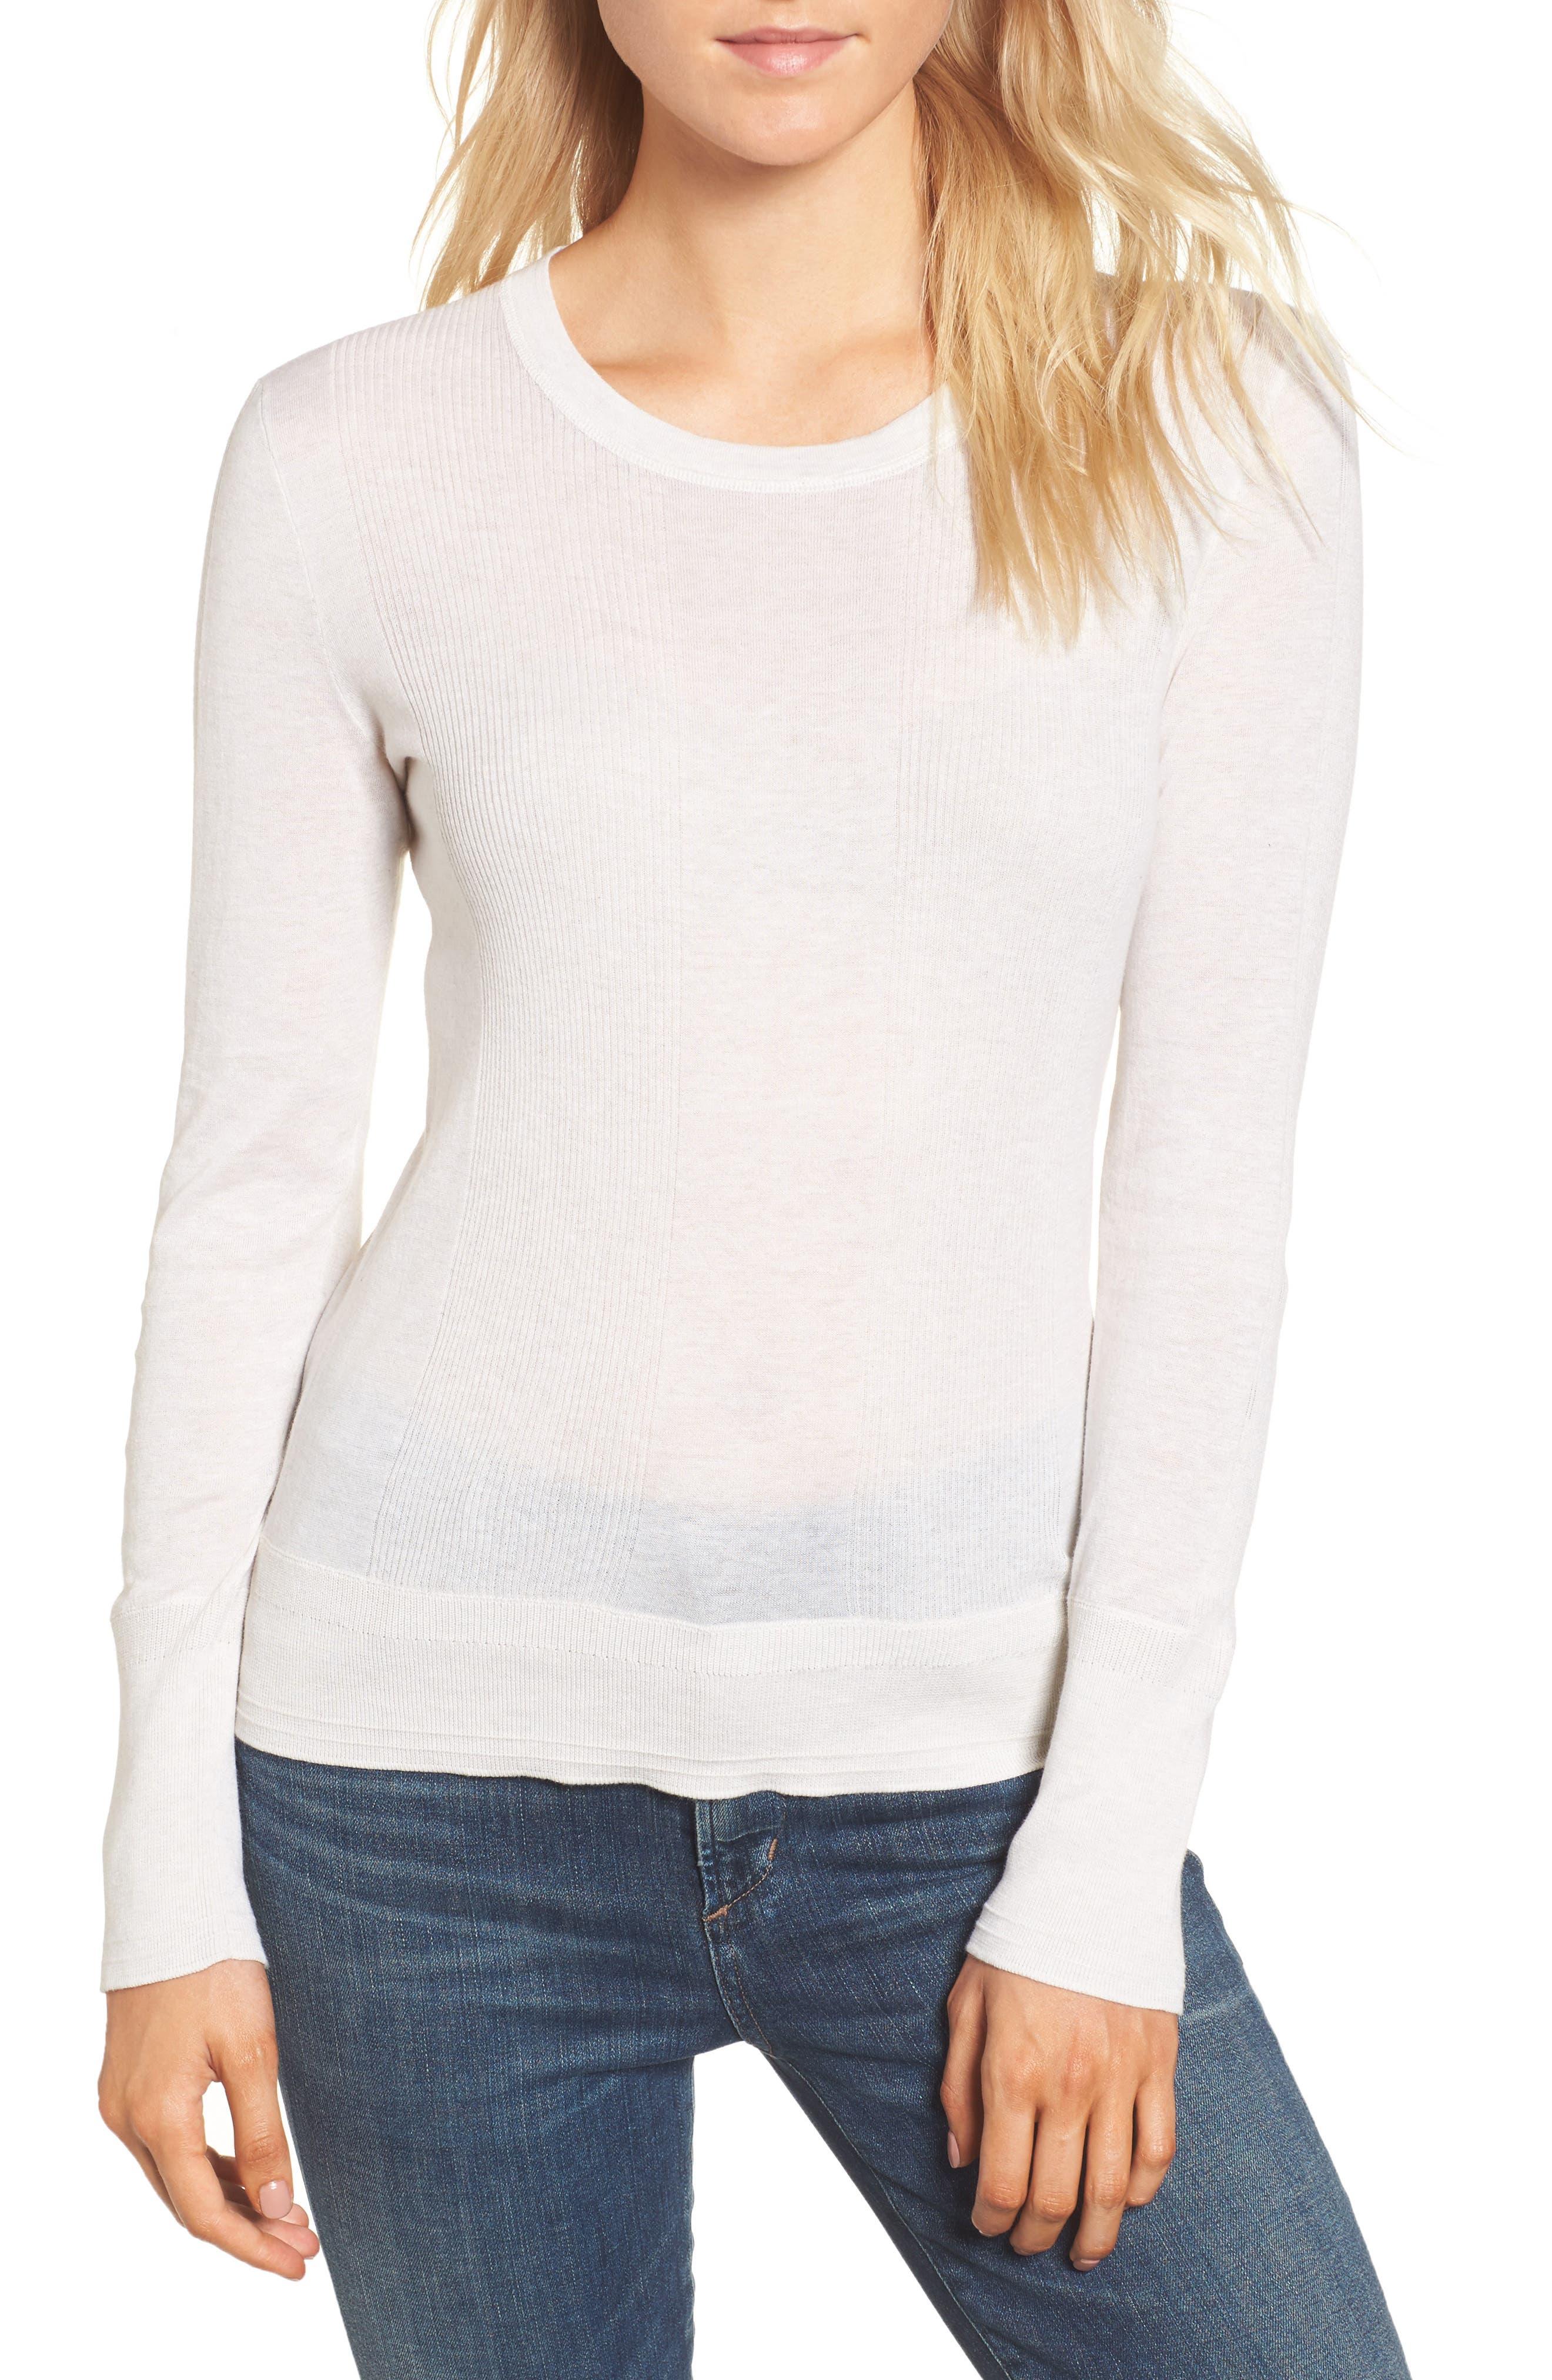 James Perse Cotton Crewneck Sweater